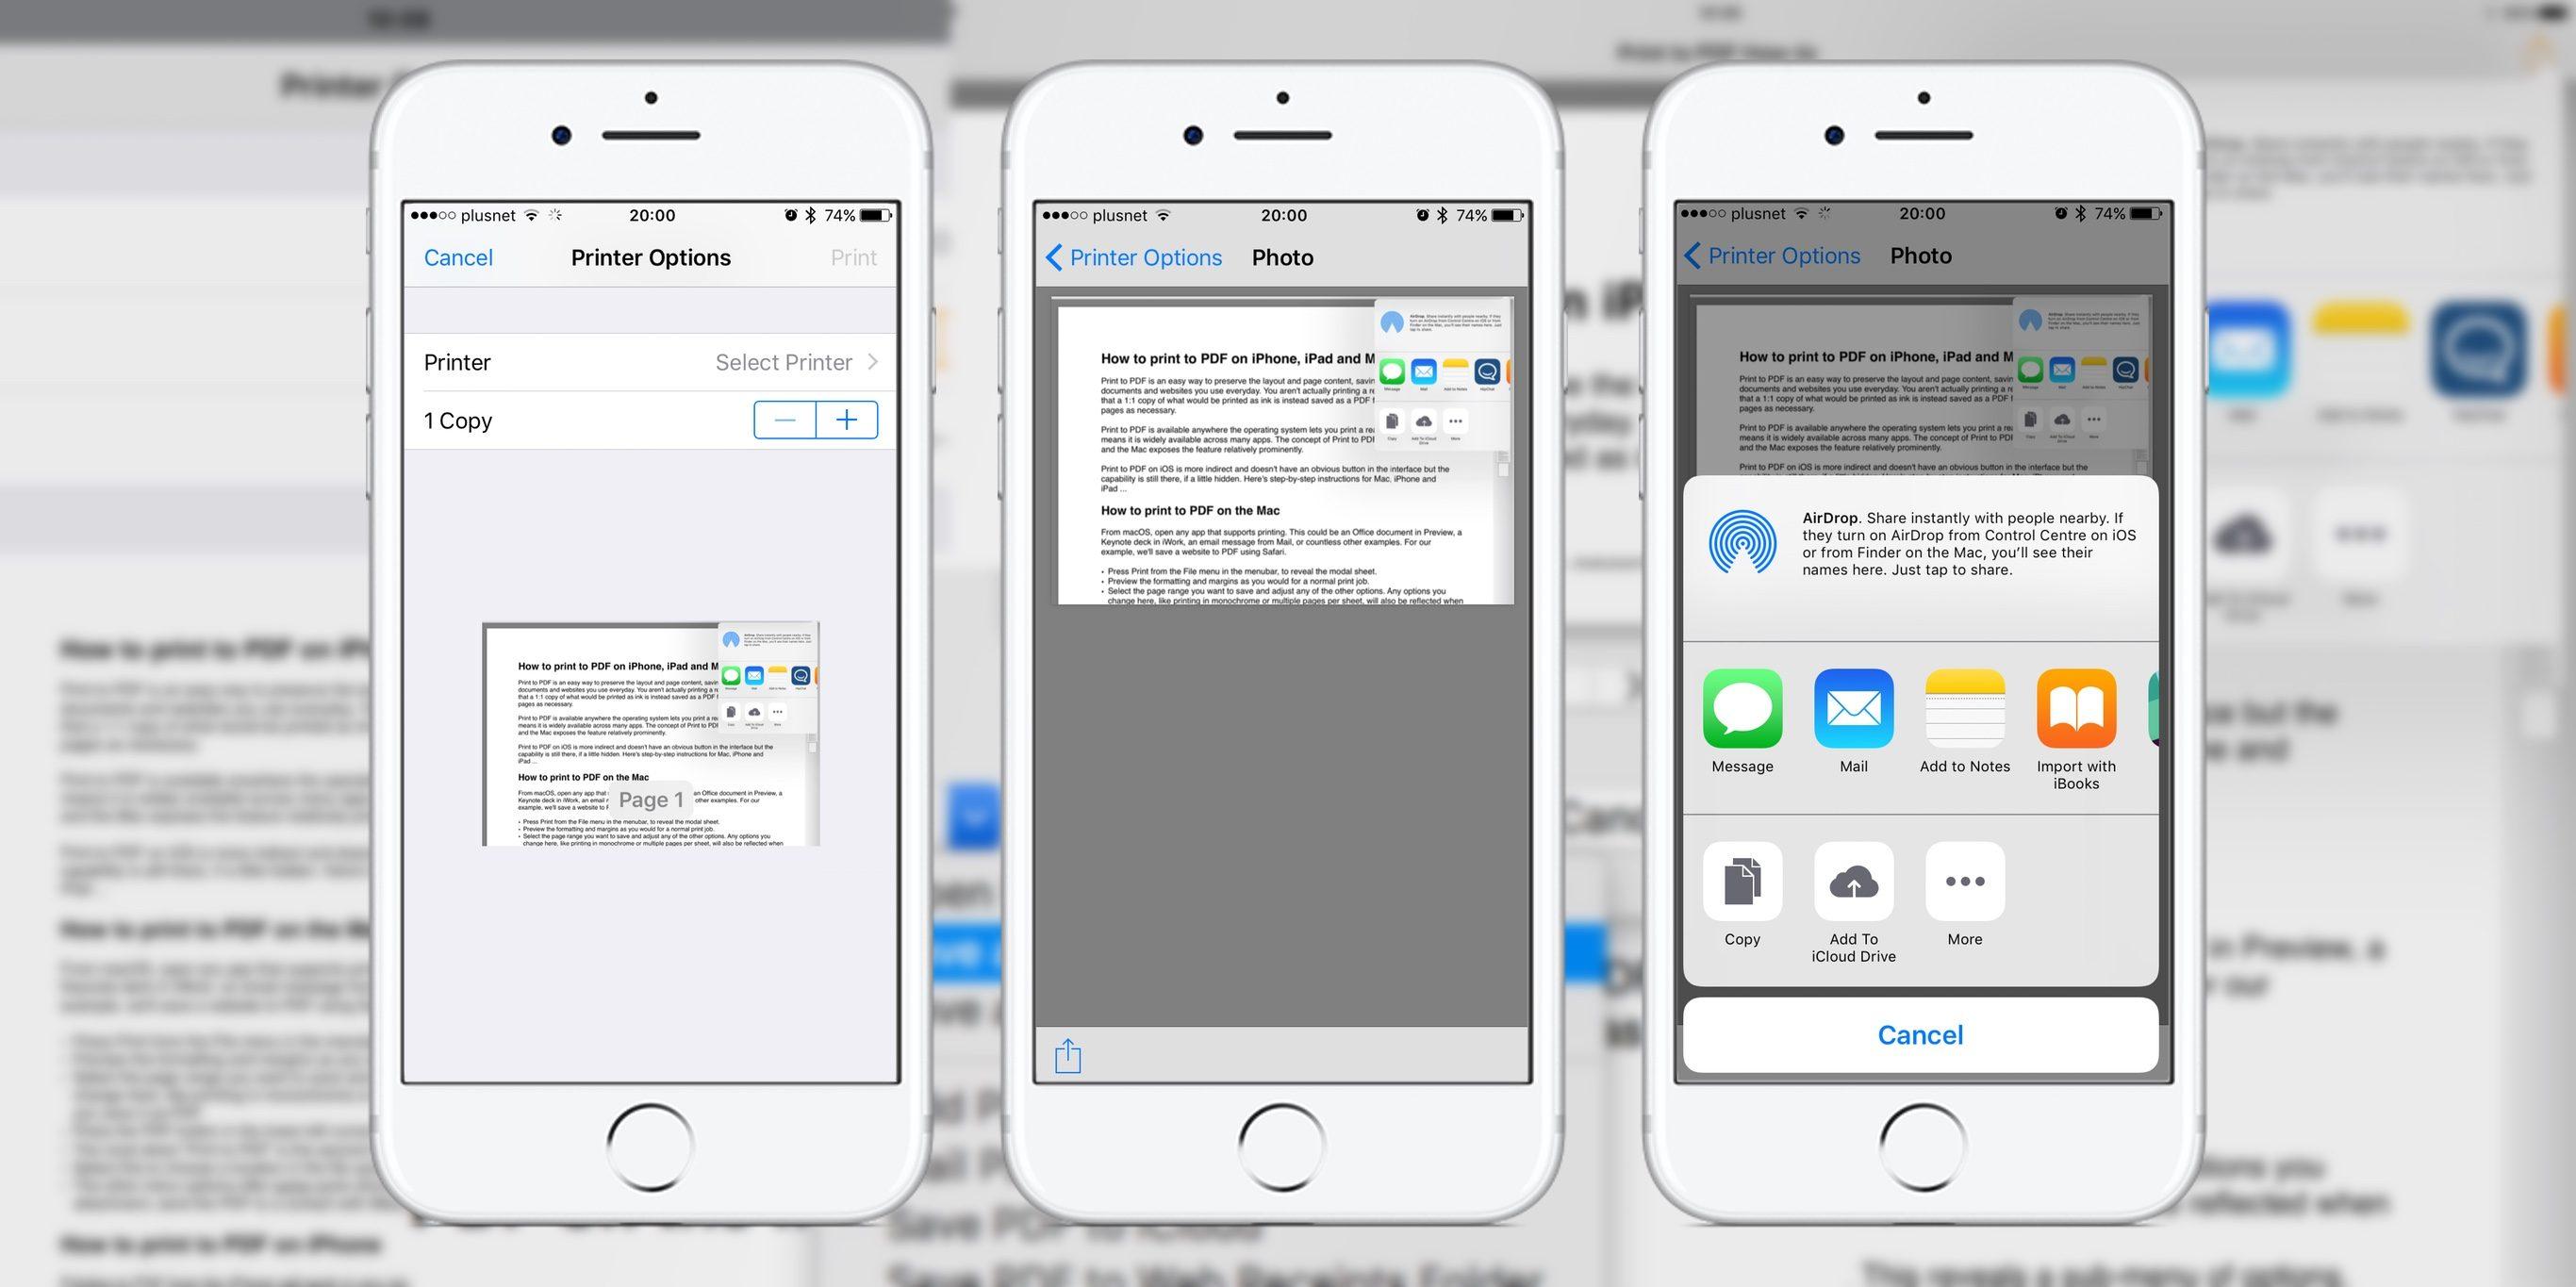 "<span href=""https://9to5mac.com/2017/04/14/how-to-print-to-pdf-on-iphone-ipad-and-mac/"">¿Cómo imprimir un PDF en el iPhone, iPad y Mac</a>"